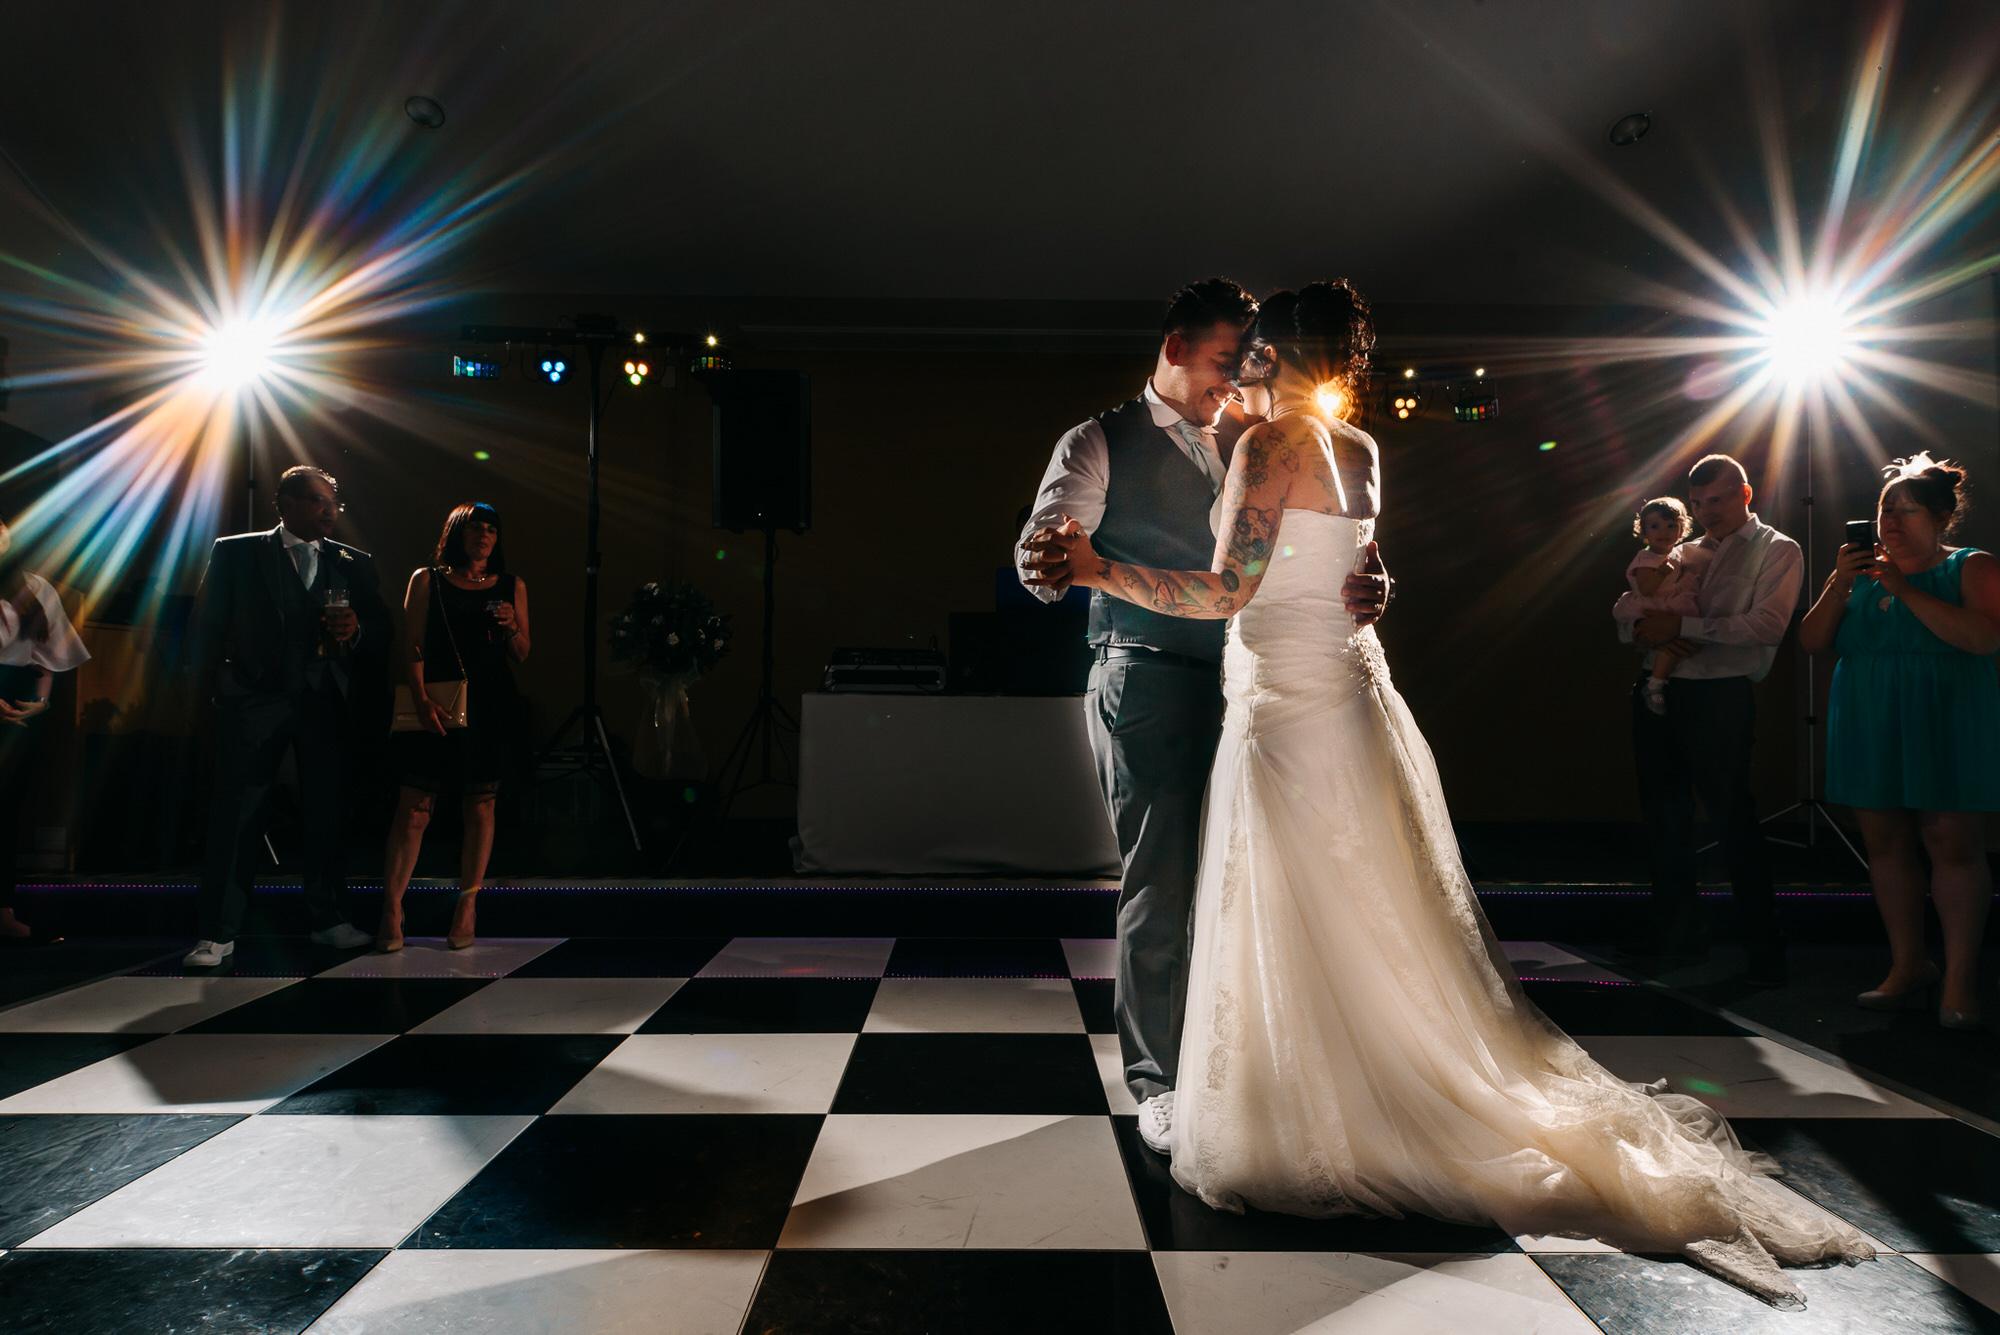 Best Of Yorkshire Wedding Photography 2017 - Martyn Hand-43.jpg